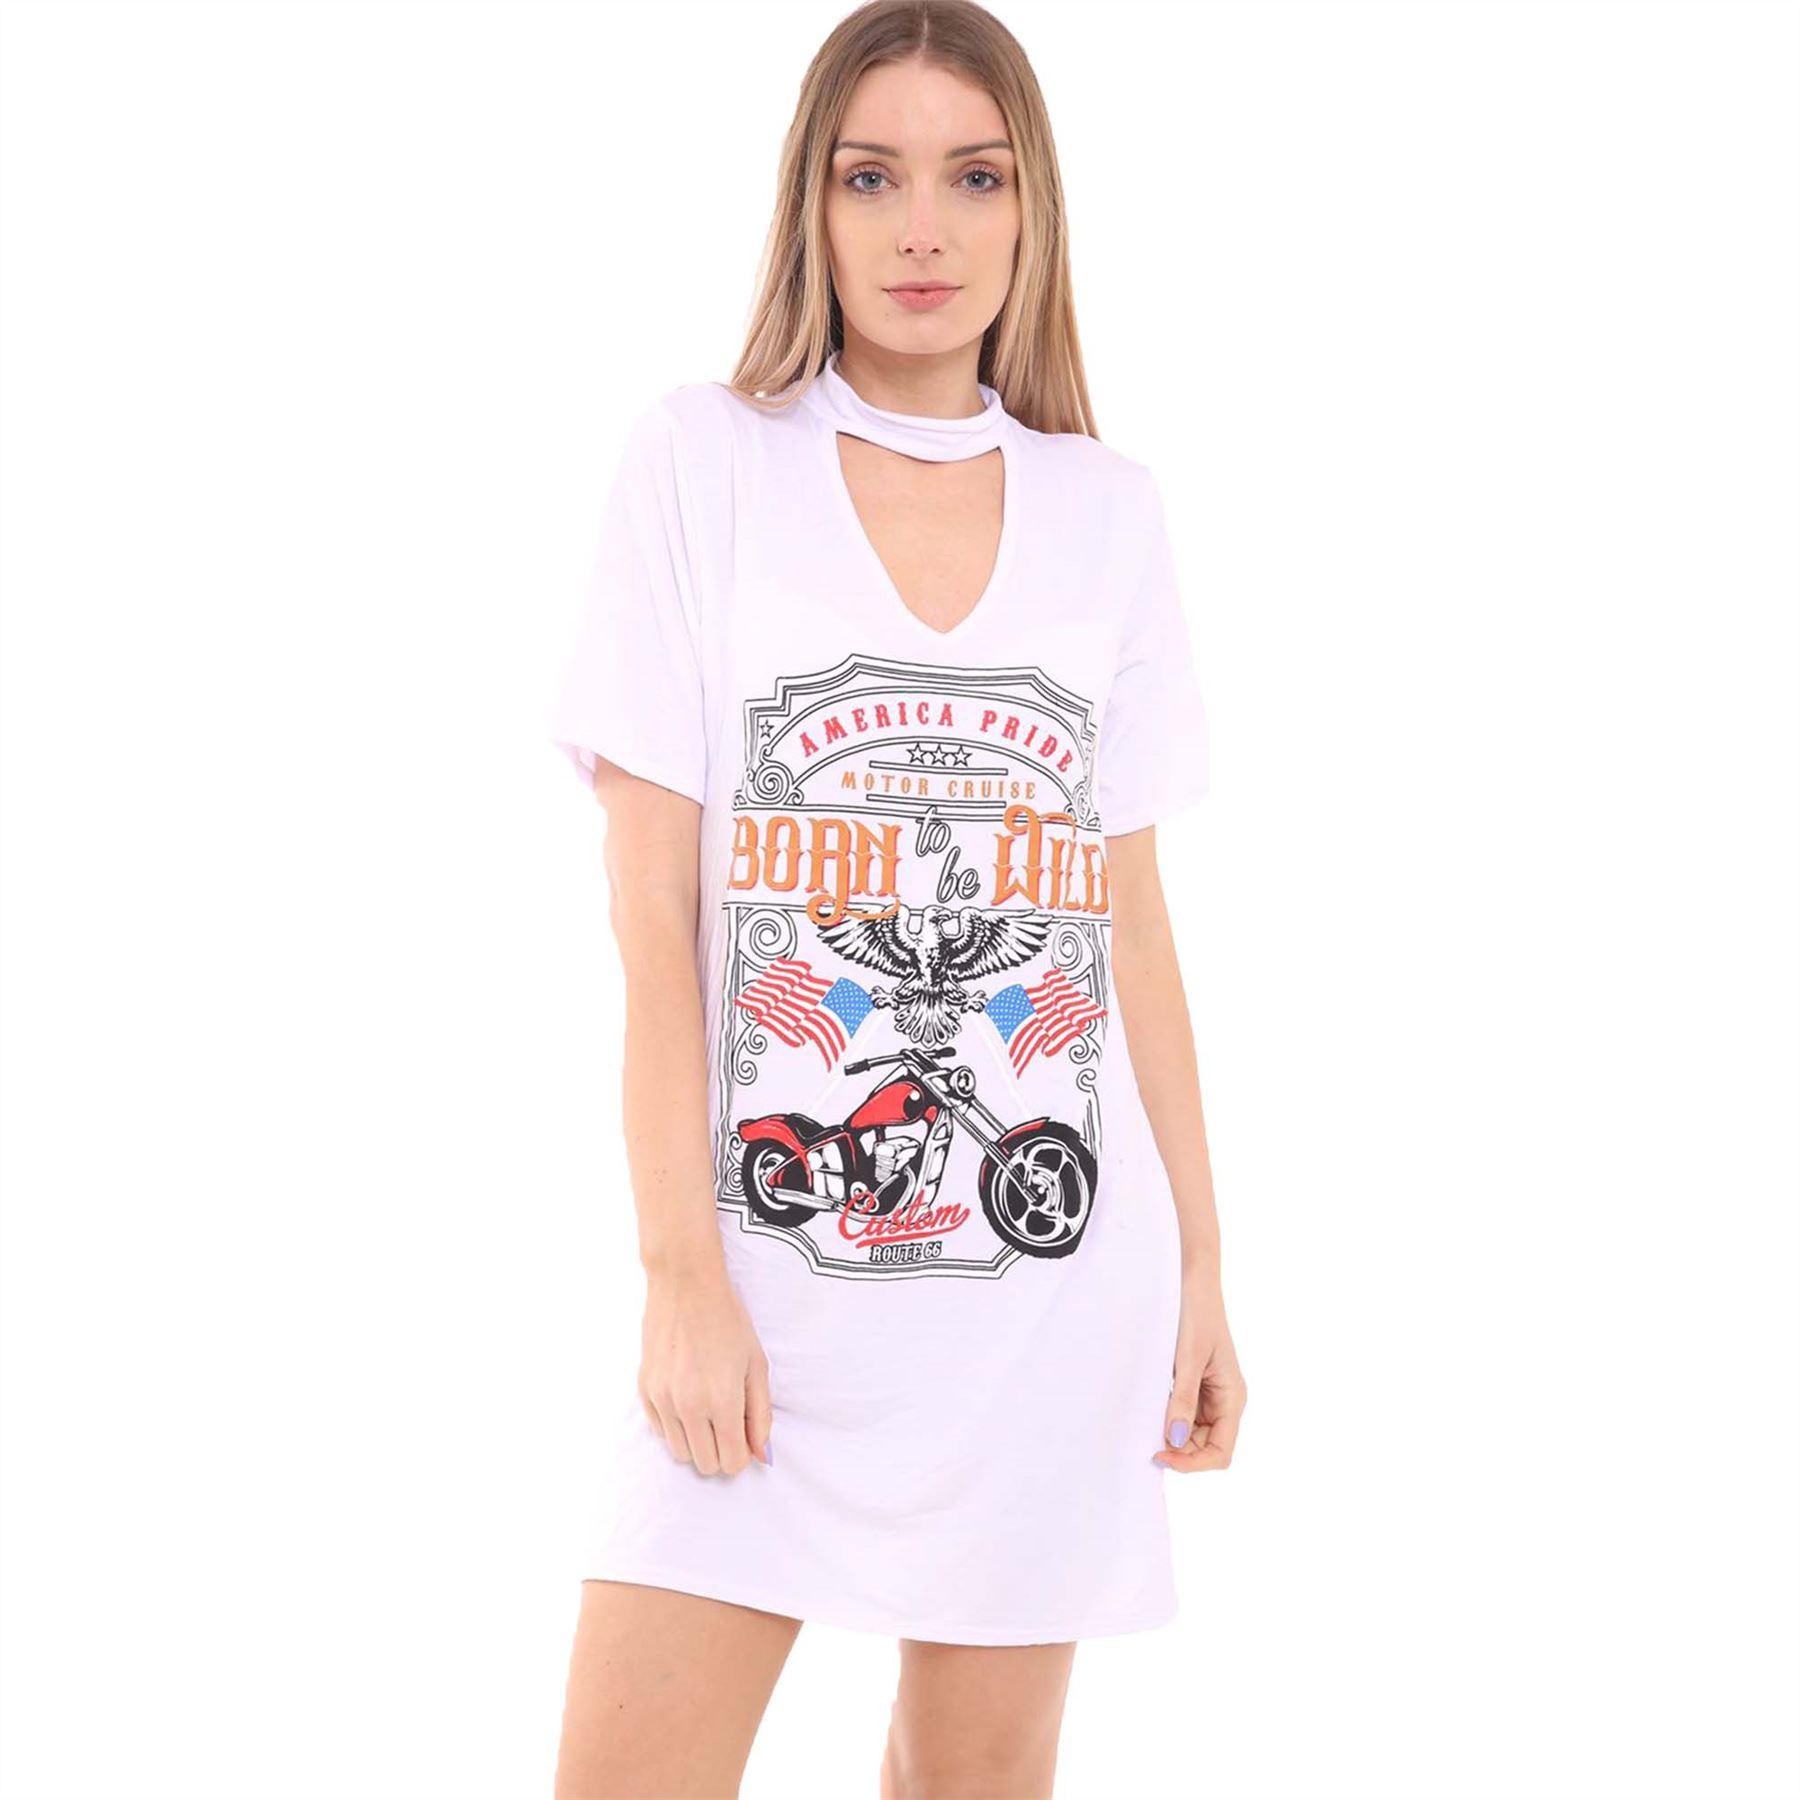 New ladies choker v neck slogan print top womens oversized for Best v neck t shirts women s